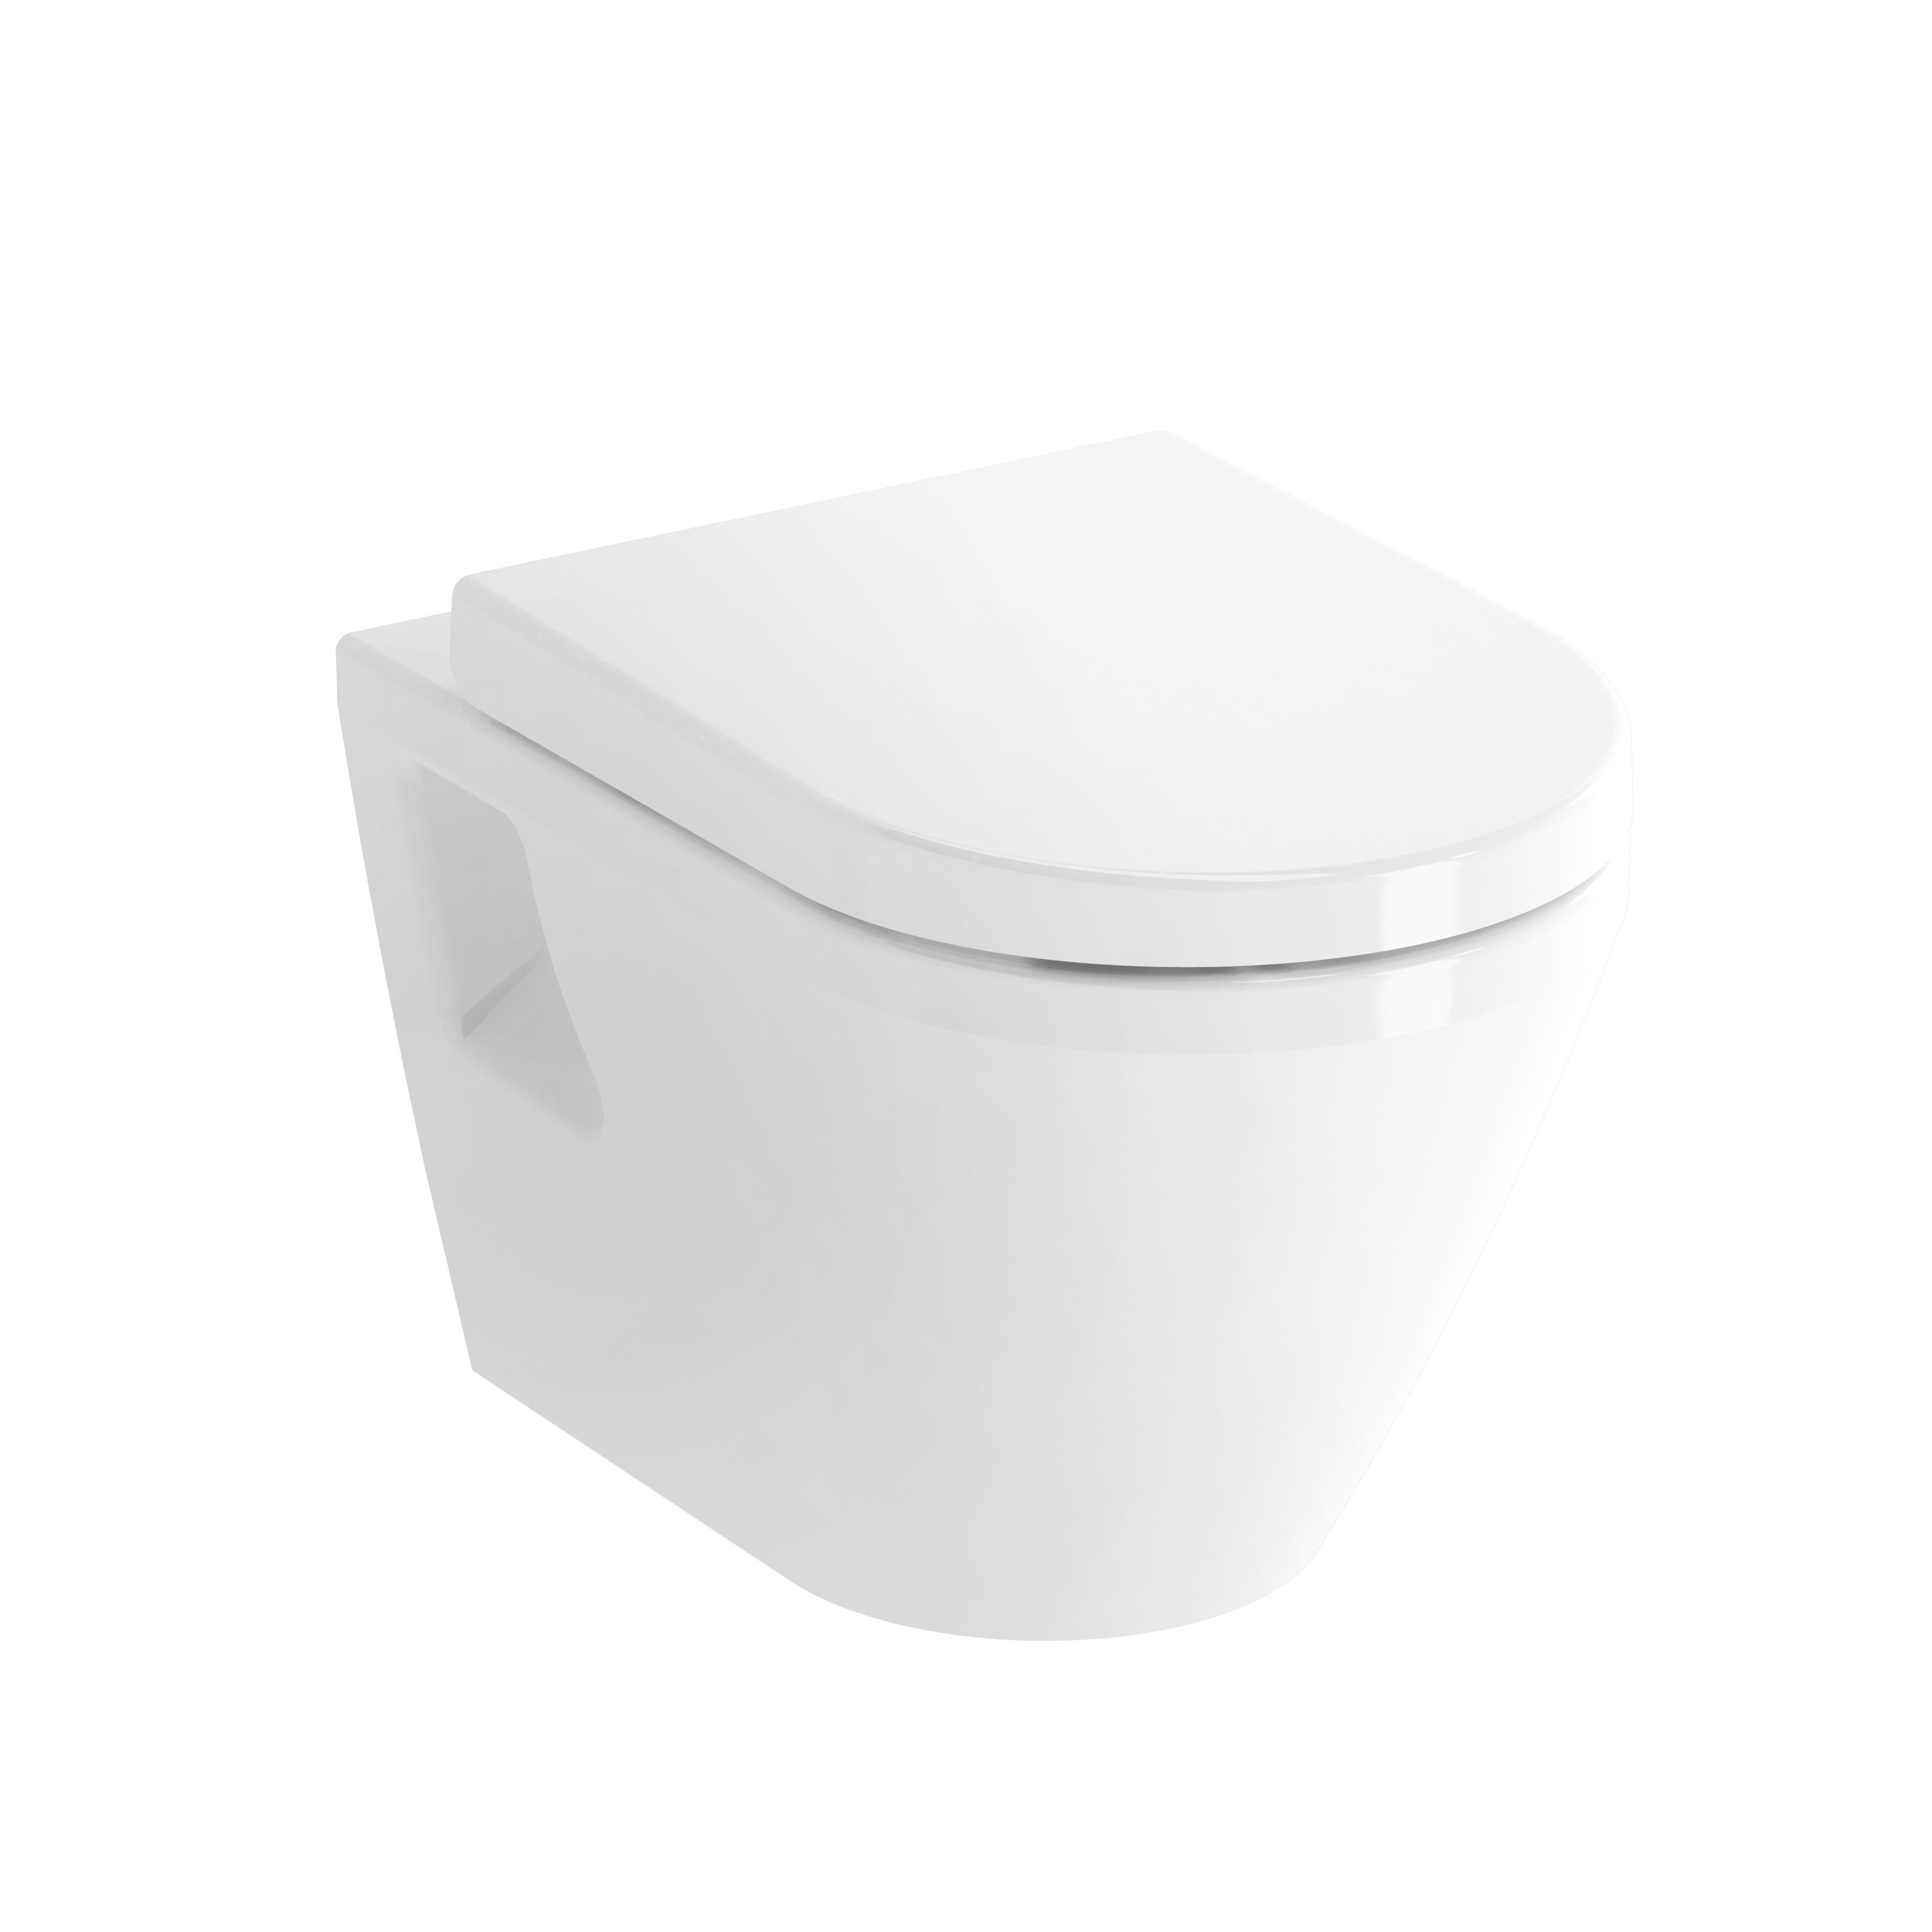 Integra Wand-WC VitrA Flush 2.0 (ohne Spülrand), Tiefspüler